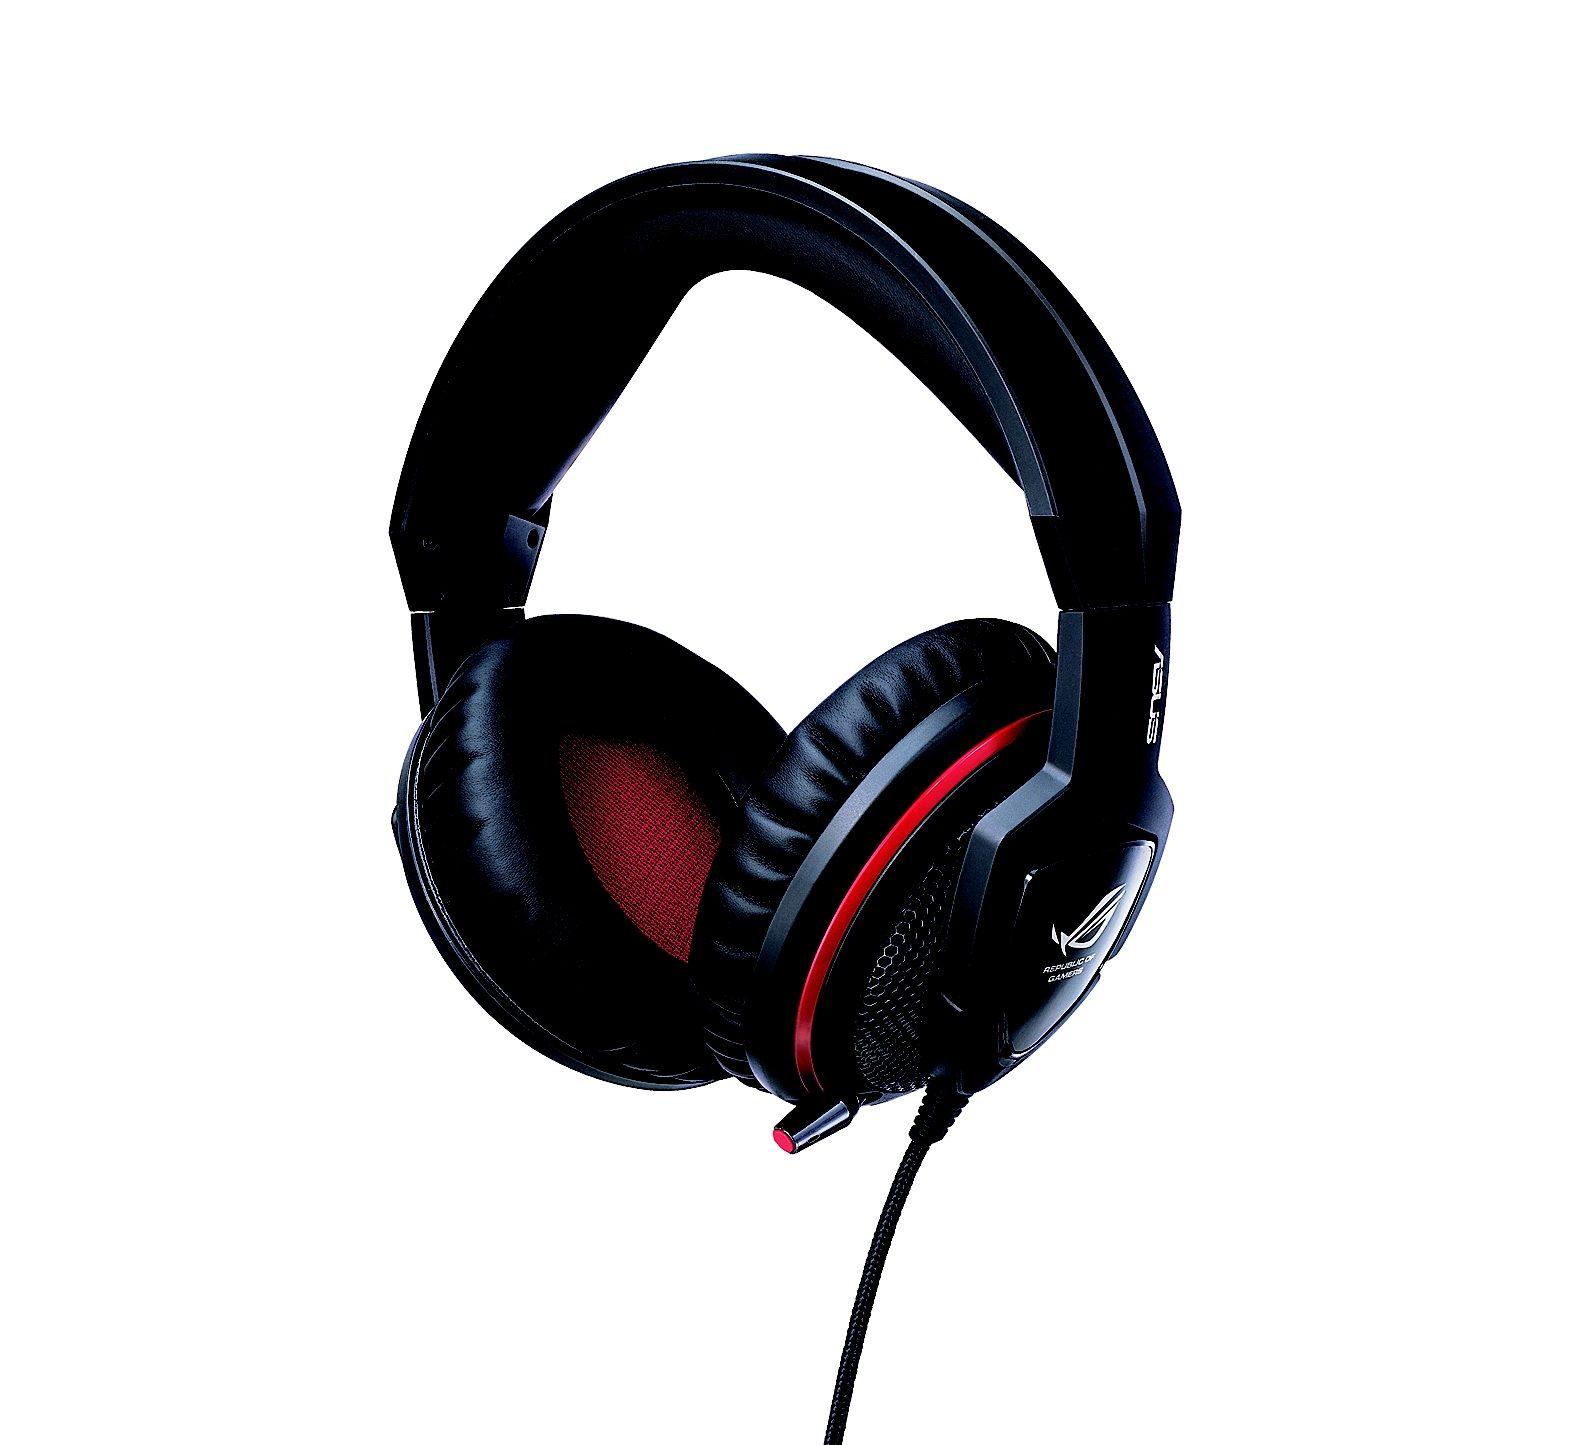 ASUS Kabelgebundenes Gaming-Headset Asus ROG Orion